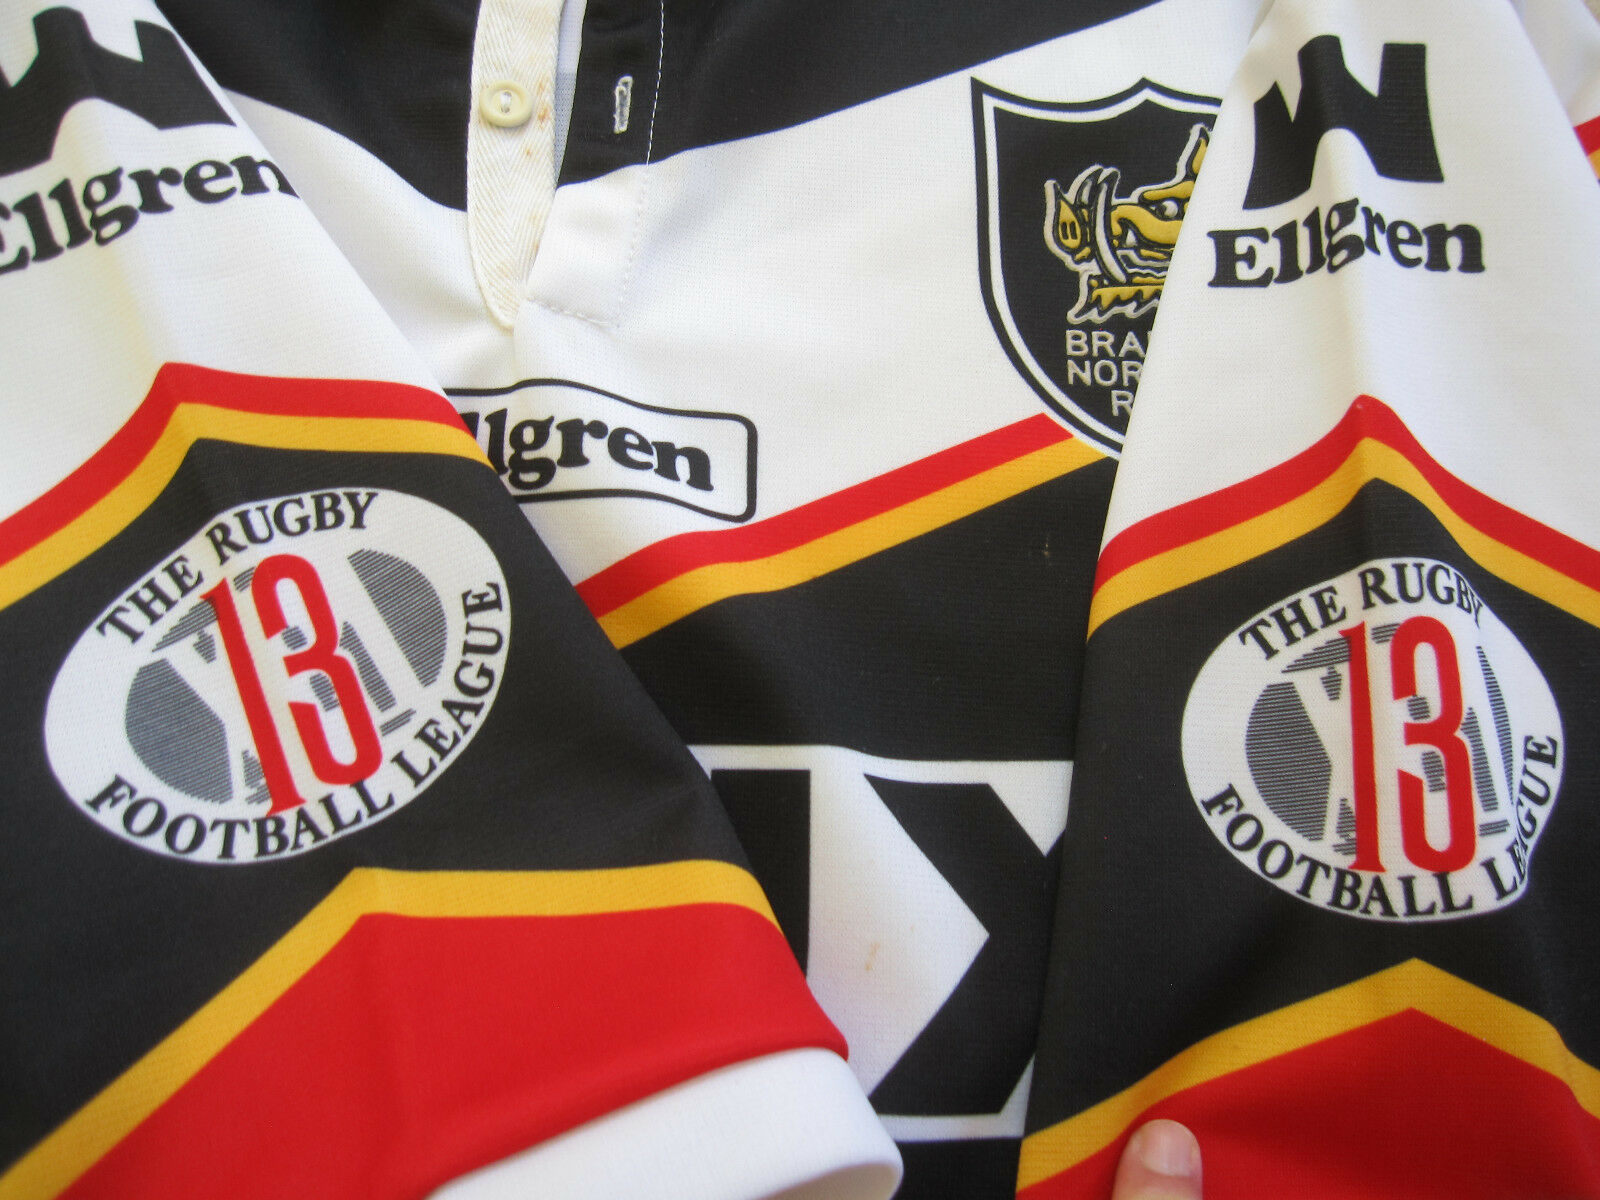 Maillot Rugby Bradford Bradford Bradford 1994 jersey Vaux Home Original Vintage Ellgren - XL 59f98a